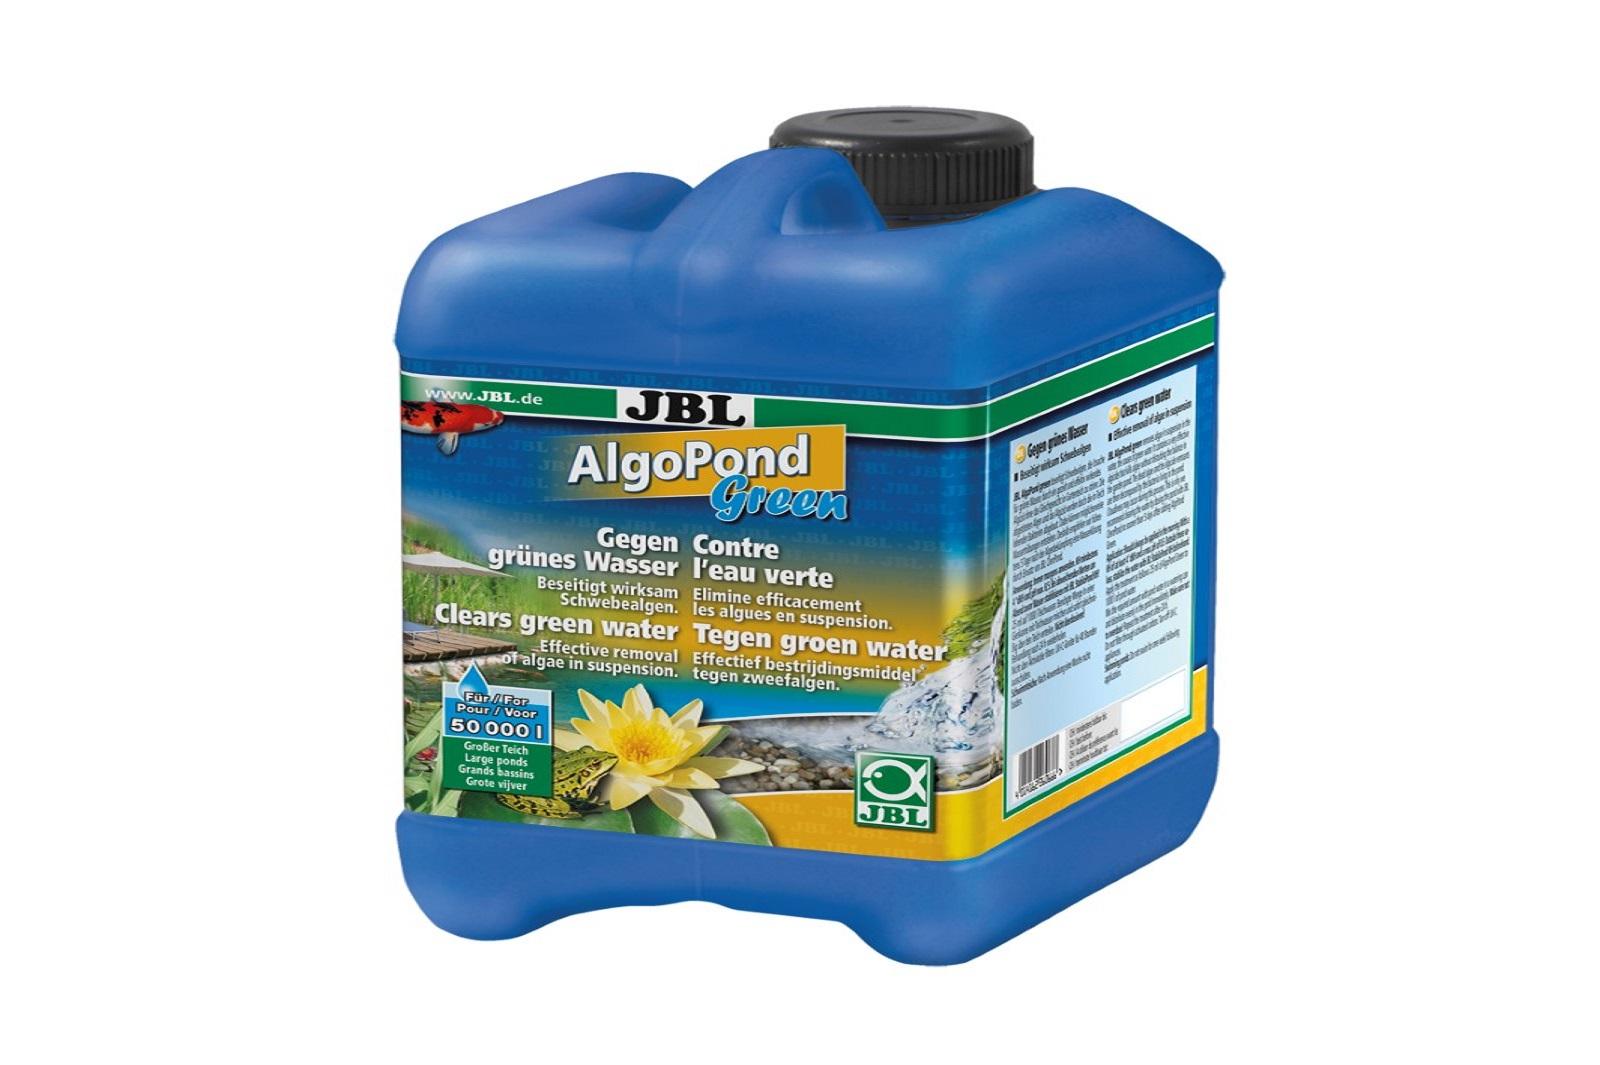 JBL AlgoPond Green 2,5 l gegen grünes Wasser löst Algenprobleme